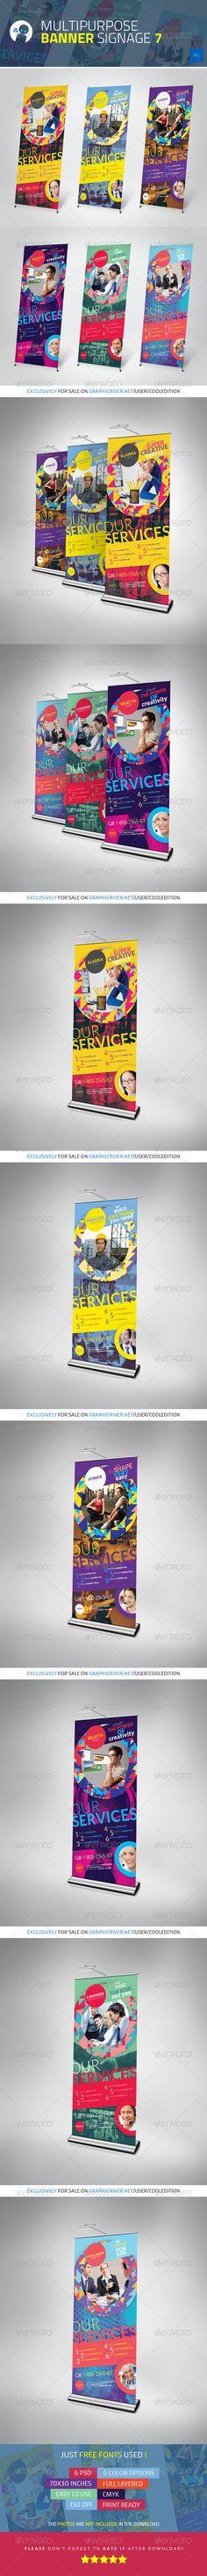 Multipurpose Banner Signage 7 - $6